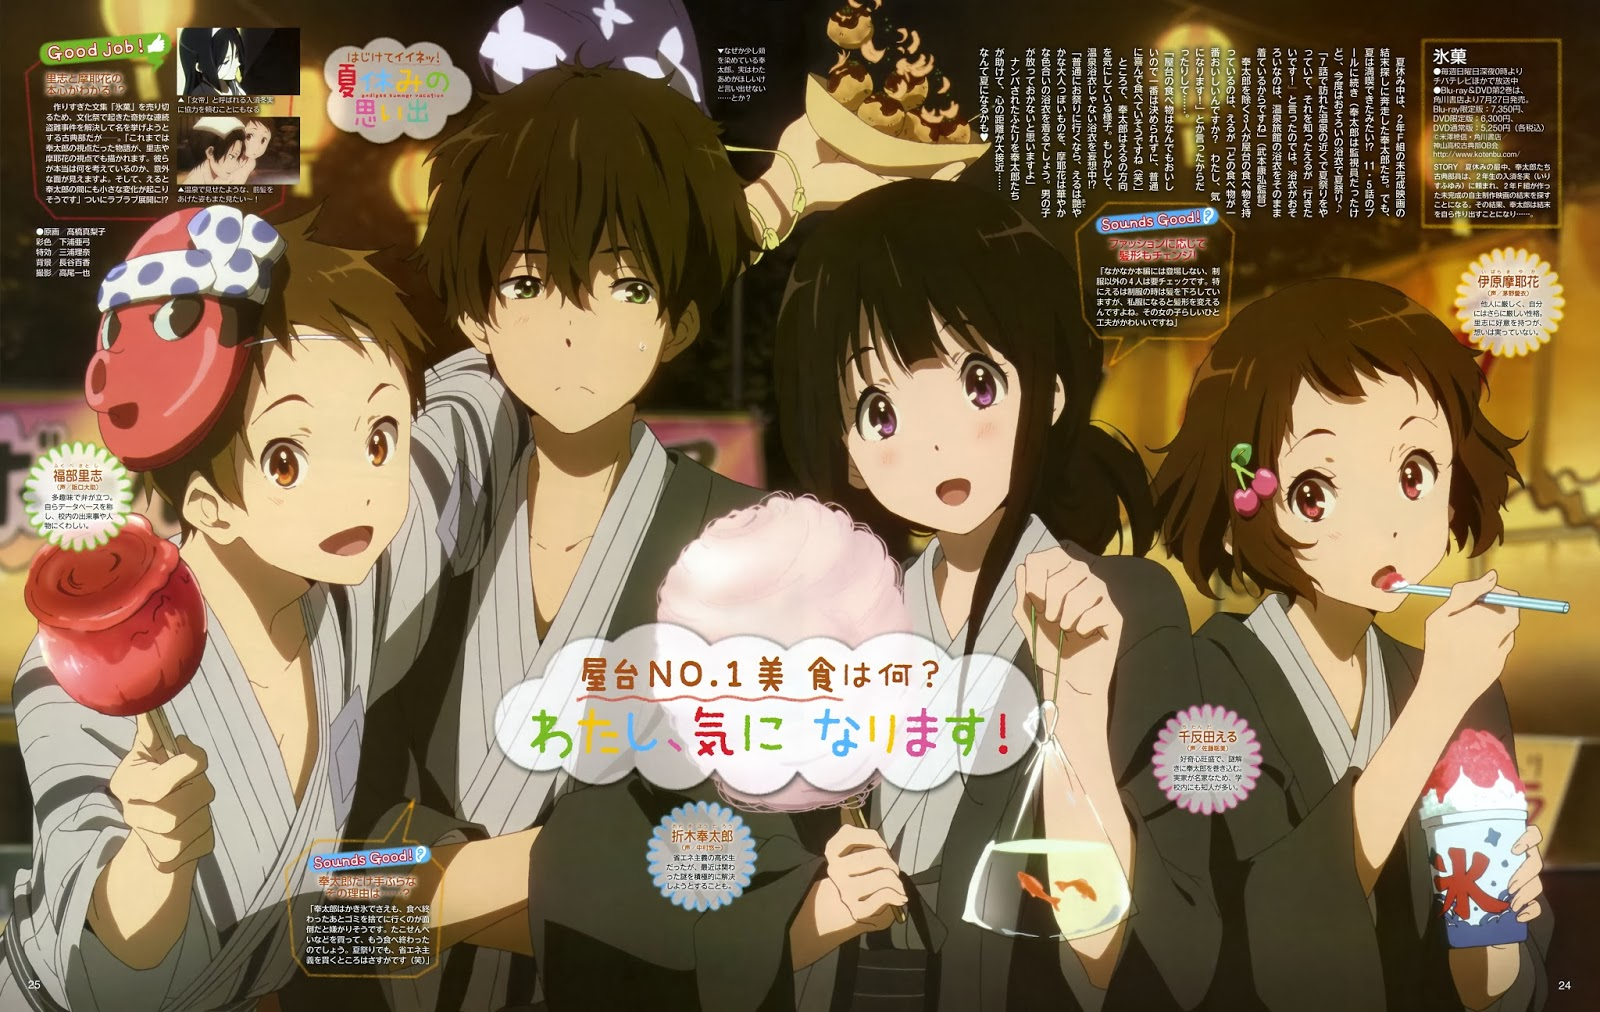 Hyouka OP2 Single - Mikansei Stride MP3 - Download Hyouka